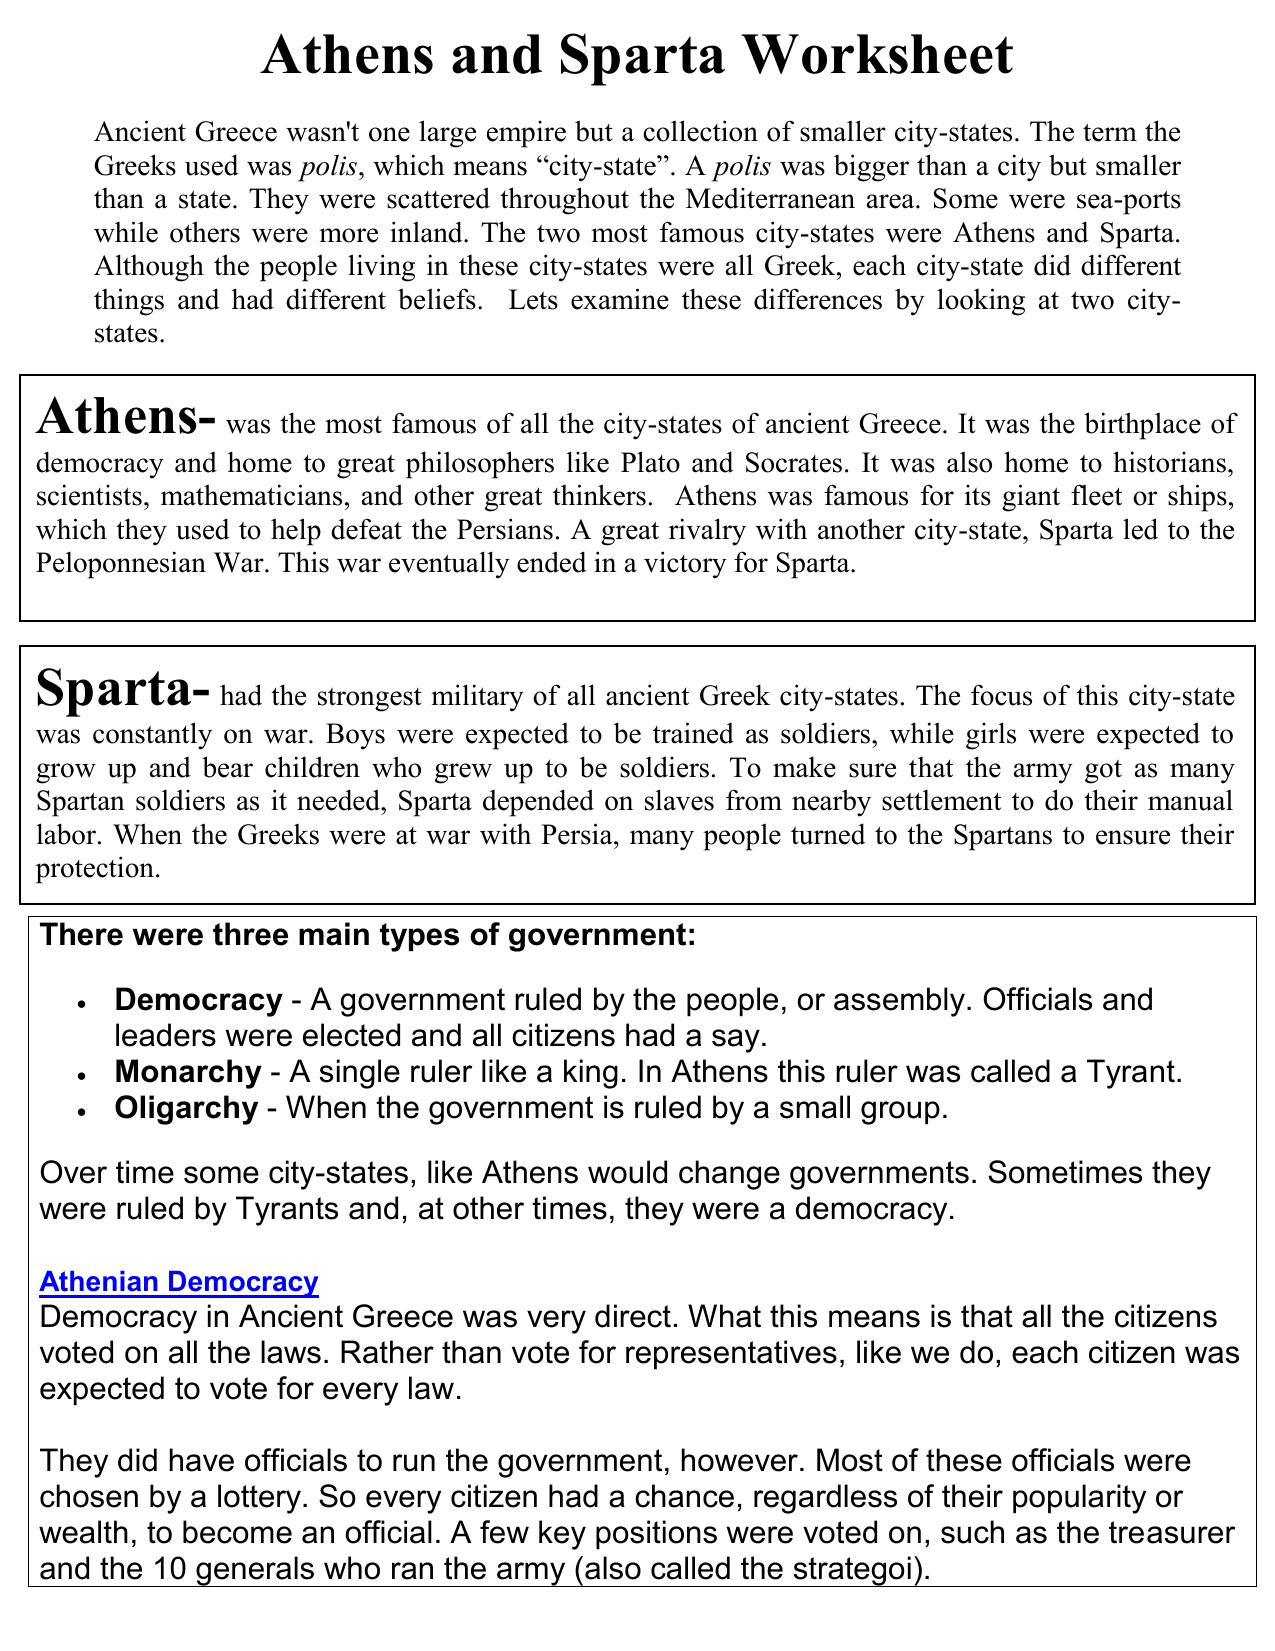 Worksheet Ancient Greece Worksheets athens and sparta worksheet